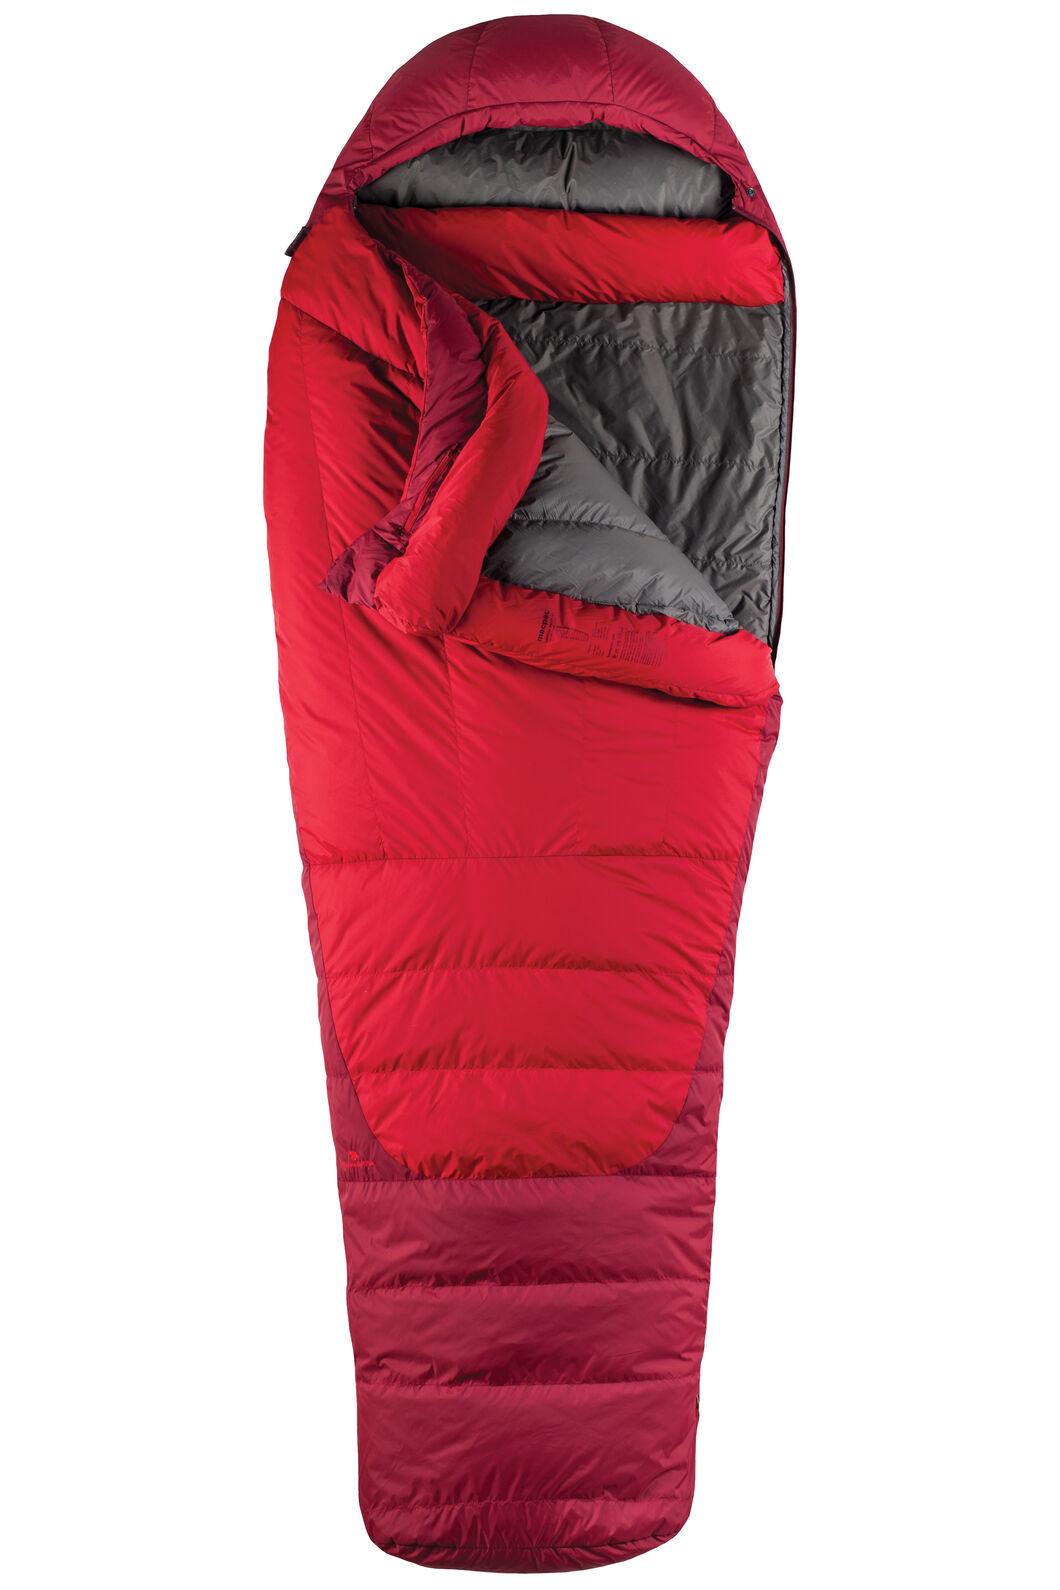 Macpac Latitude XP Goose Down 700 Sleeping Bag - Extra Large, Chilli, hi-res